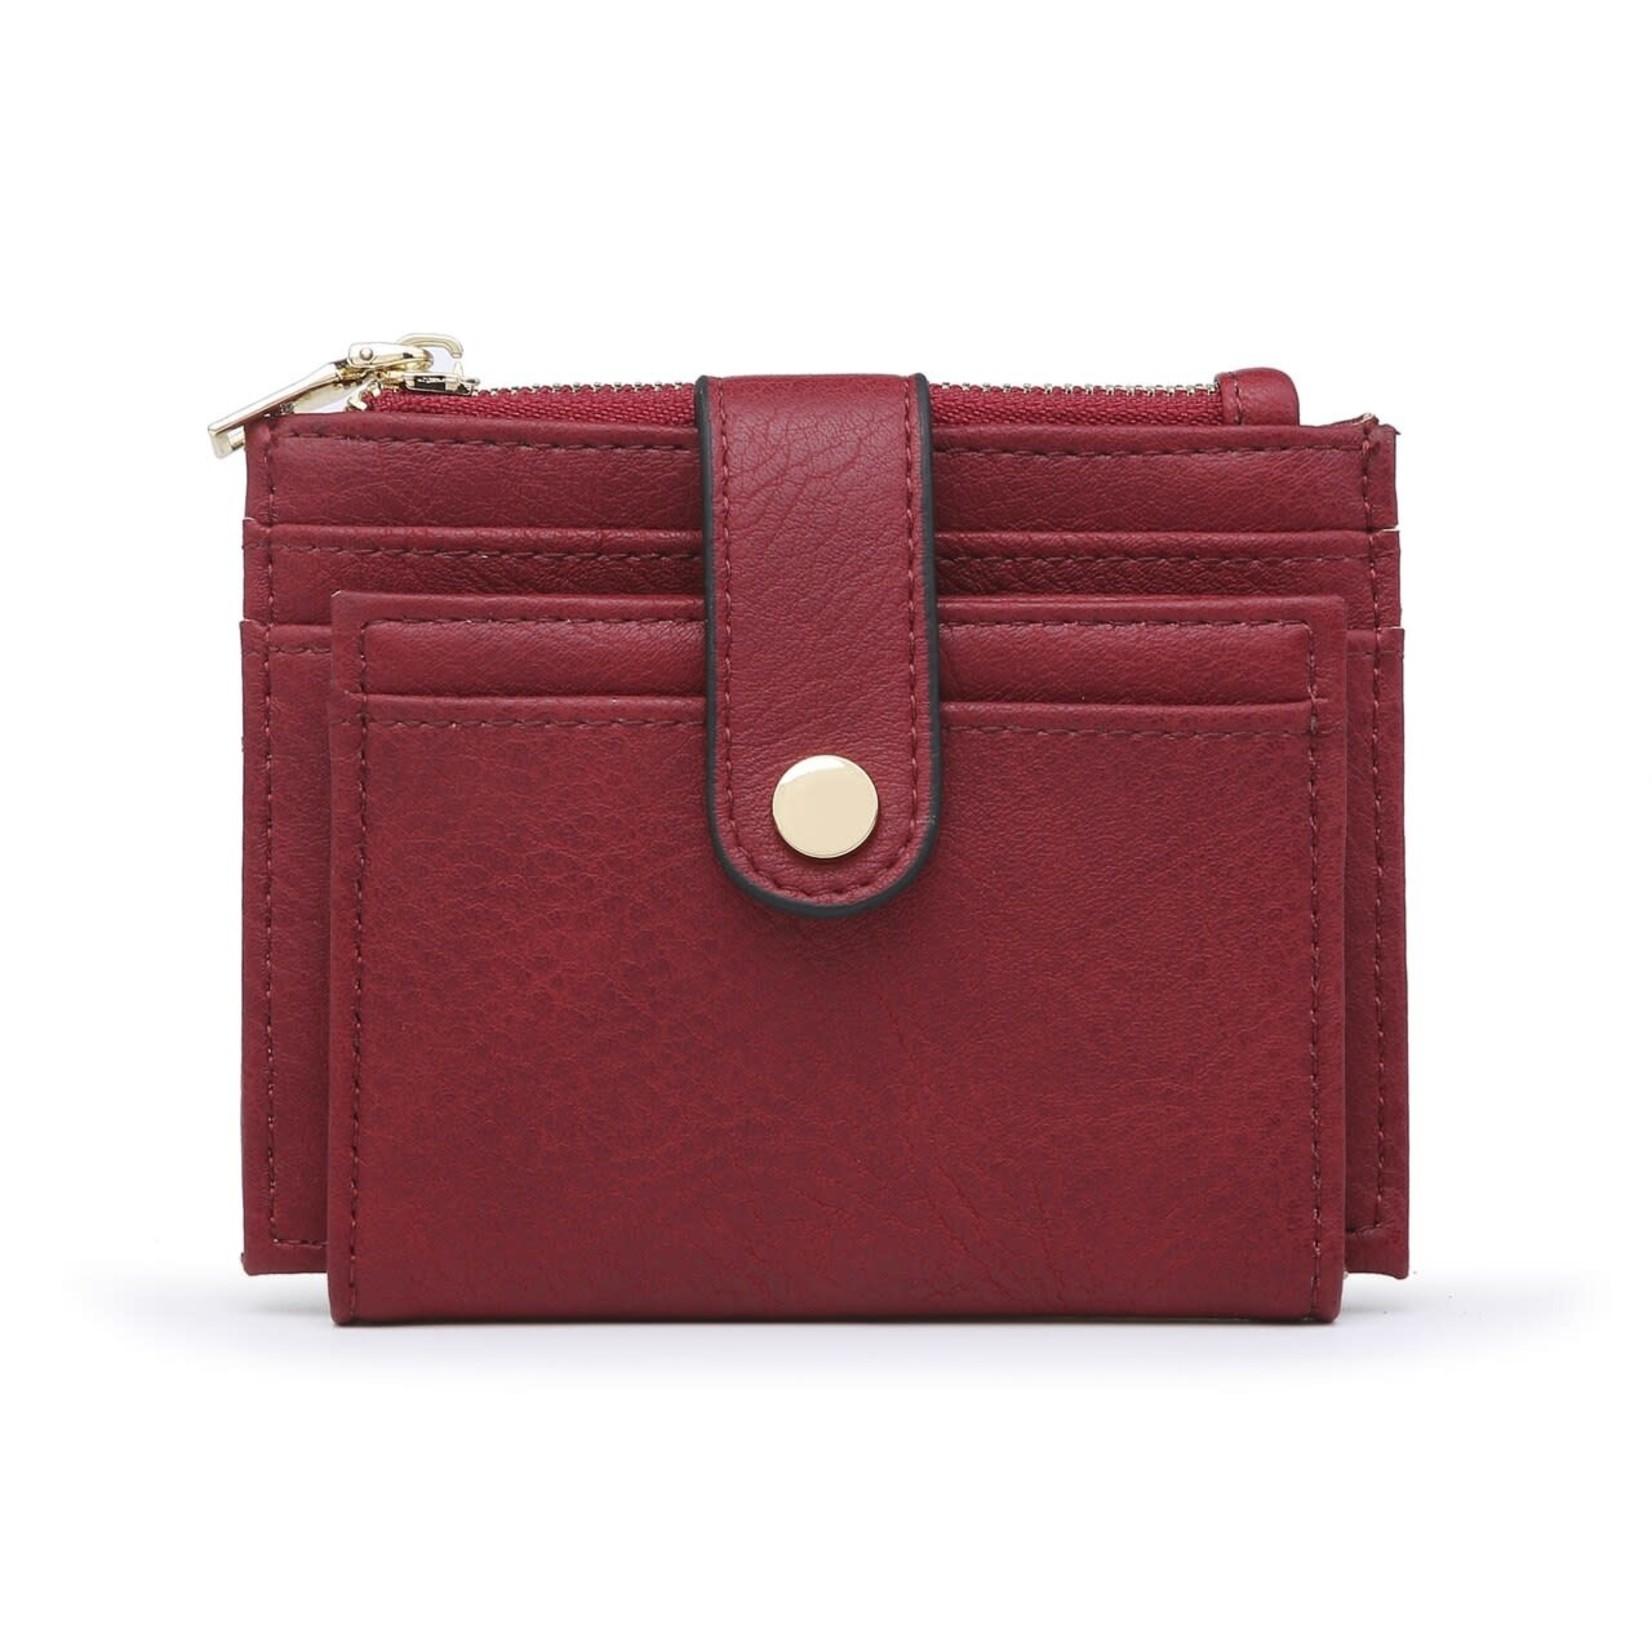 Wine Wallet/Credit Card Holder in Vegan Leather